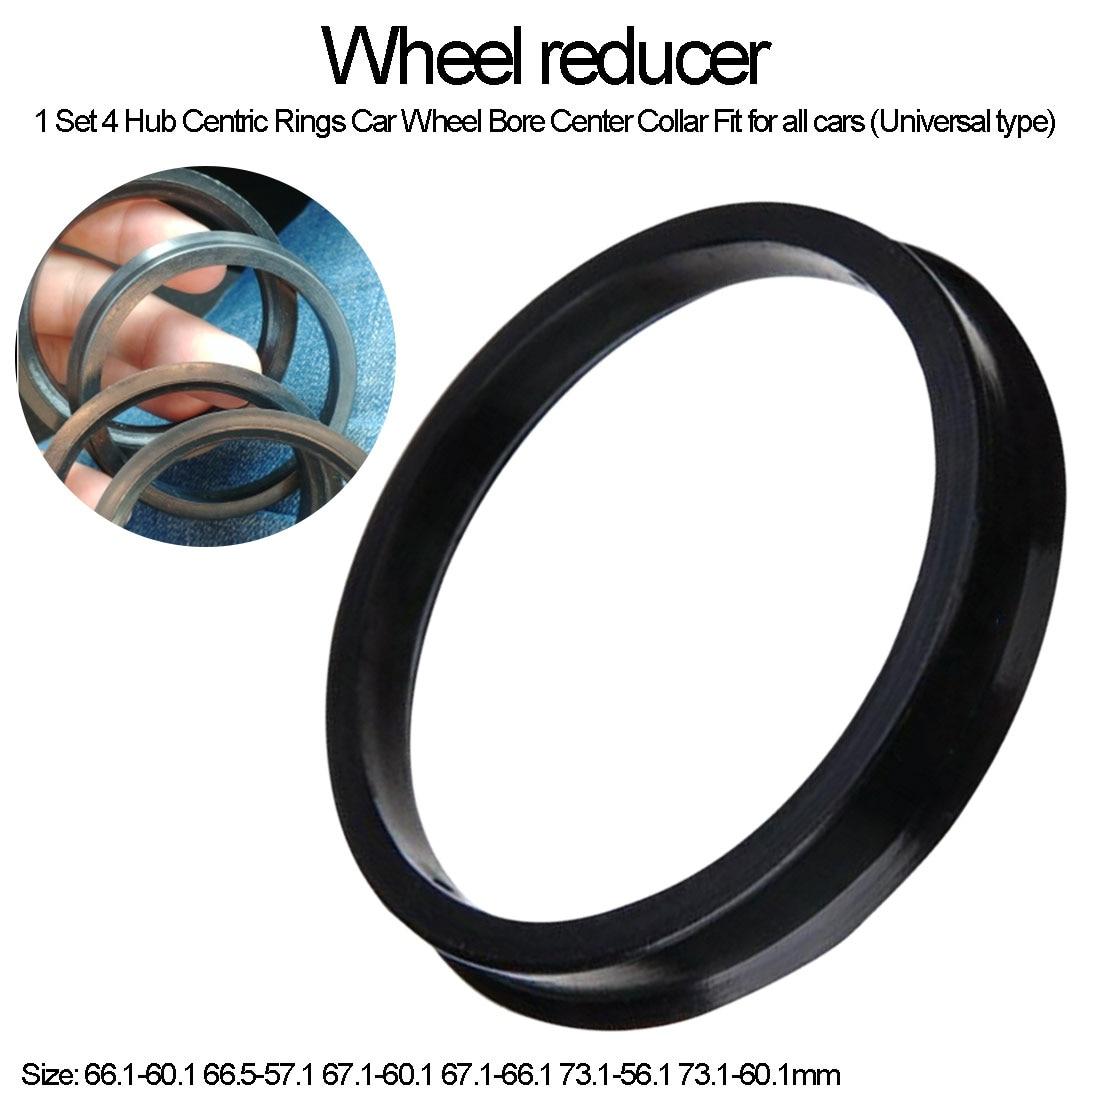 4pcs Car Wheel Bore Center Collar 66.1-60.1 66.5-57.1 67.1-60.1 67.1-66.1 73.1-56.1 73.1-60.1mm Hub Centric Ring